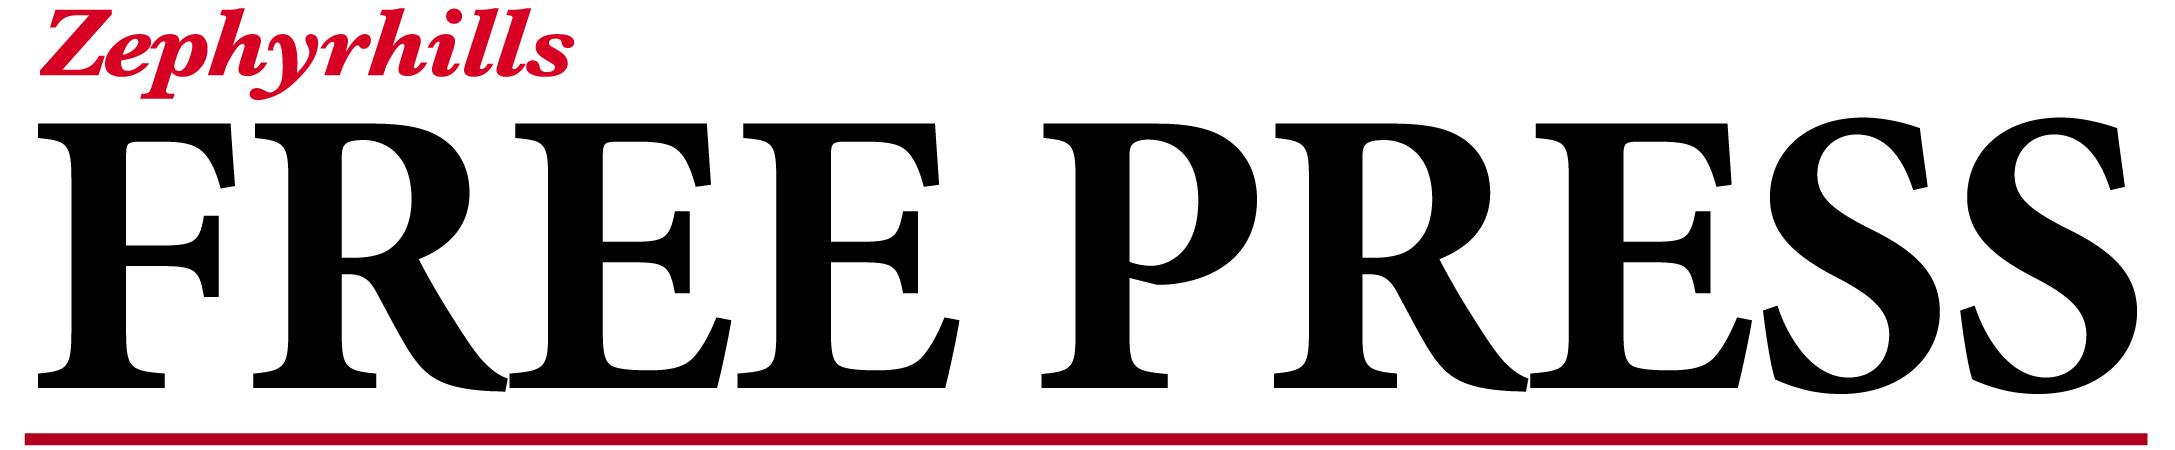 Zephyrhills Free Press - Online Newspaper